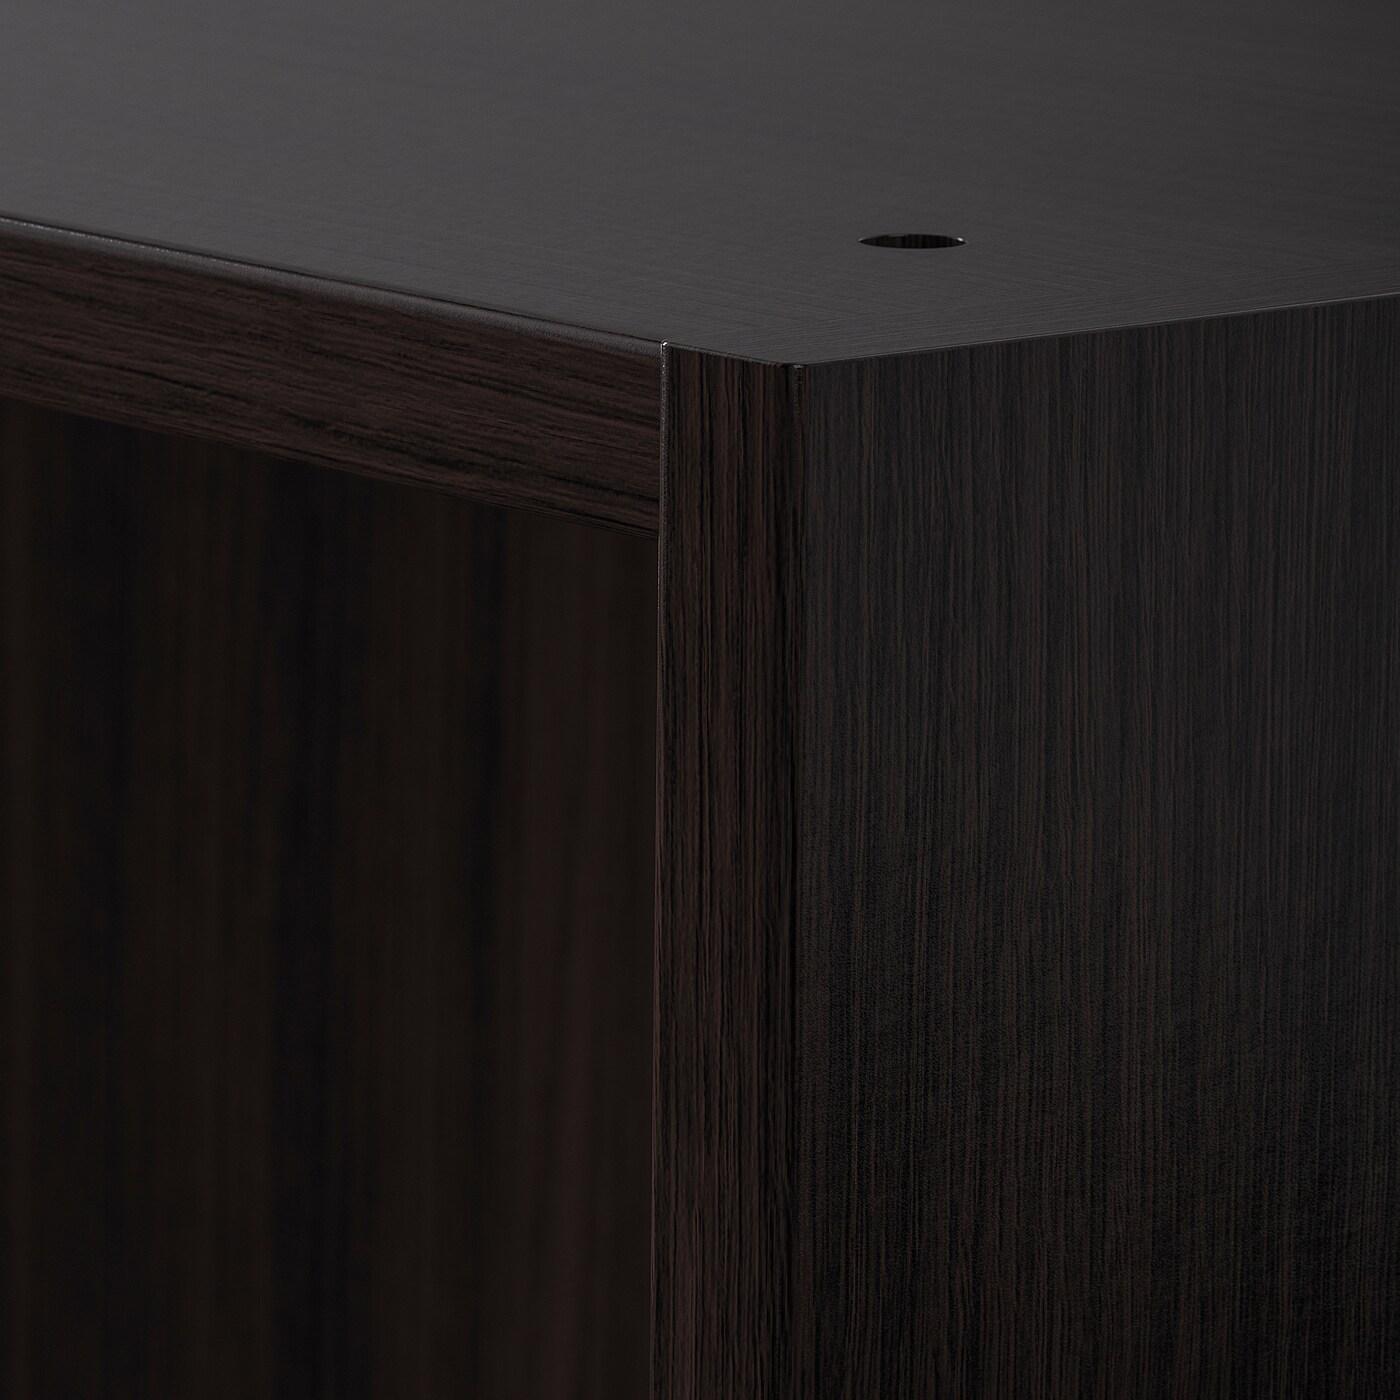 PAX Wardrobe frame, black-brown, 100x58x201 cm